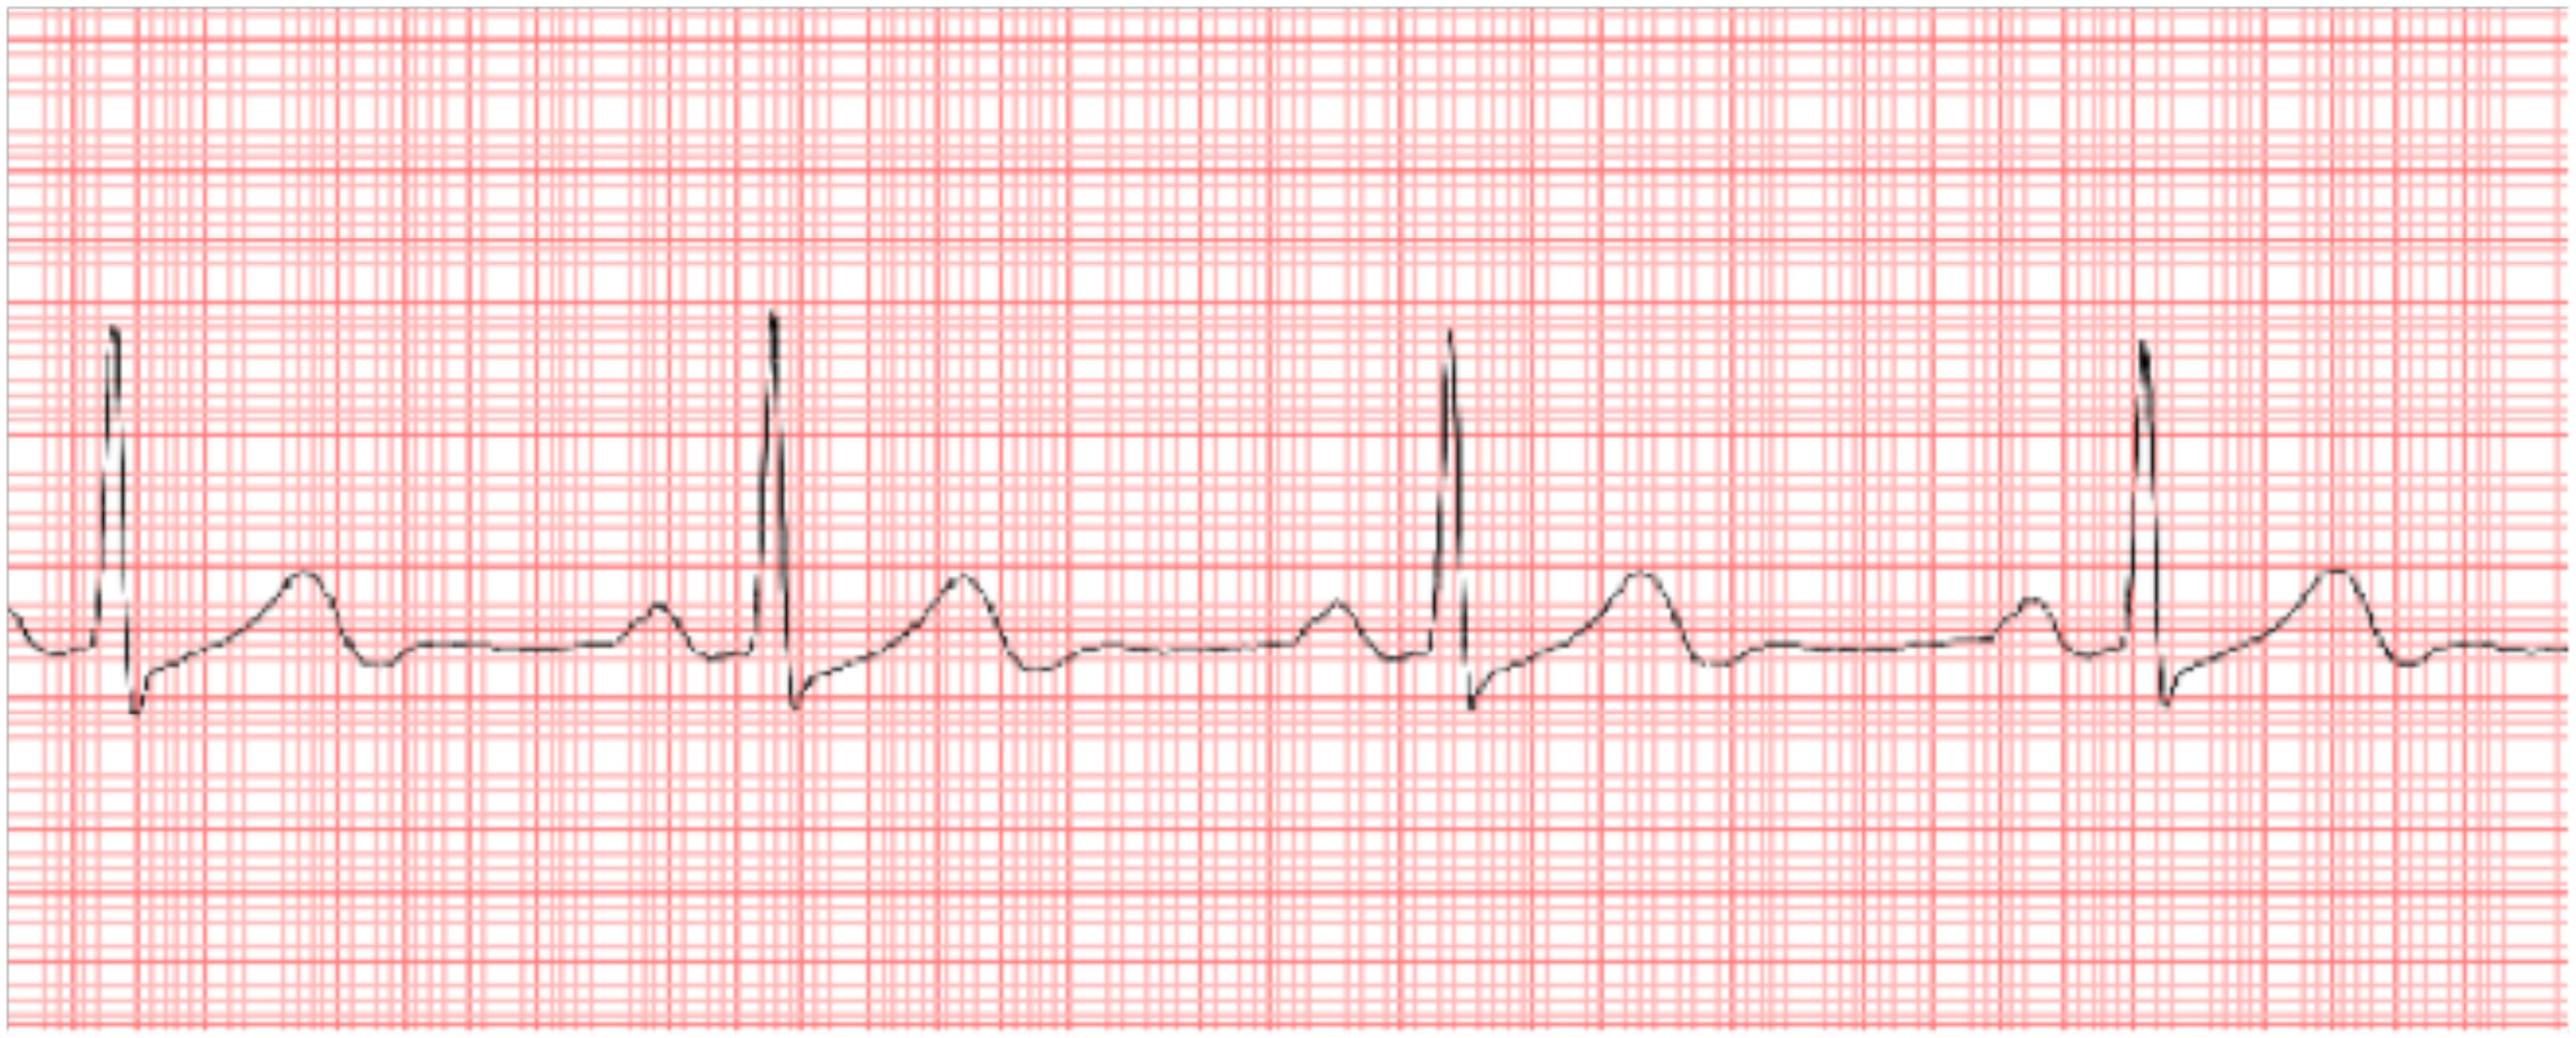 Herzkurve